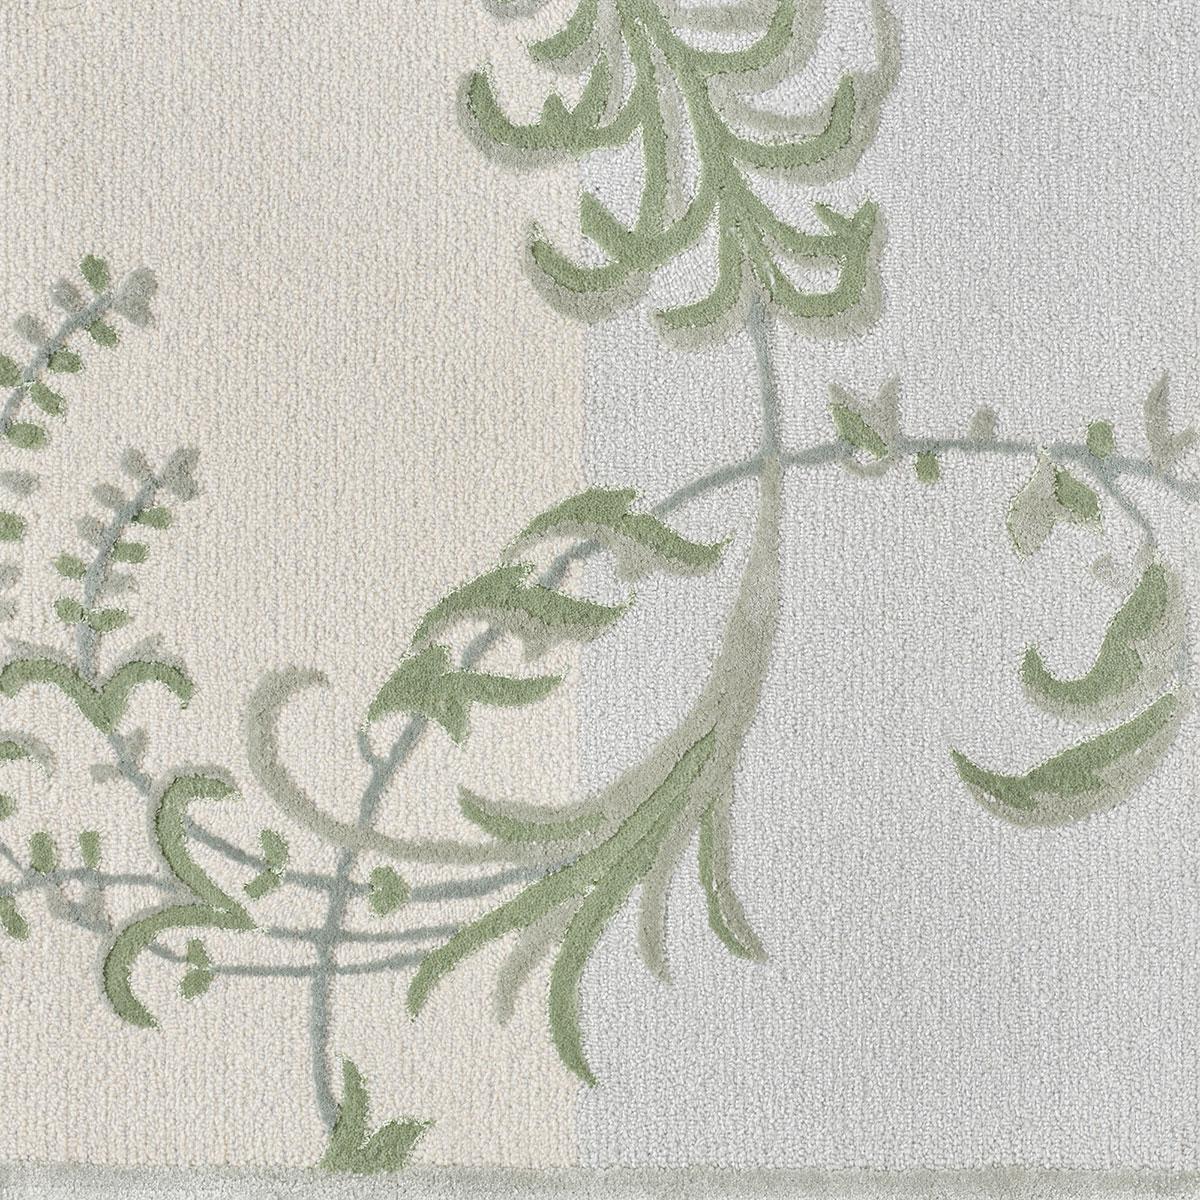 bagatelle-stripe_wool-silk_hand-tufted_patterson-flynn-martin_pfm